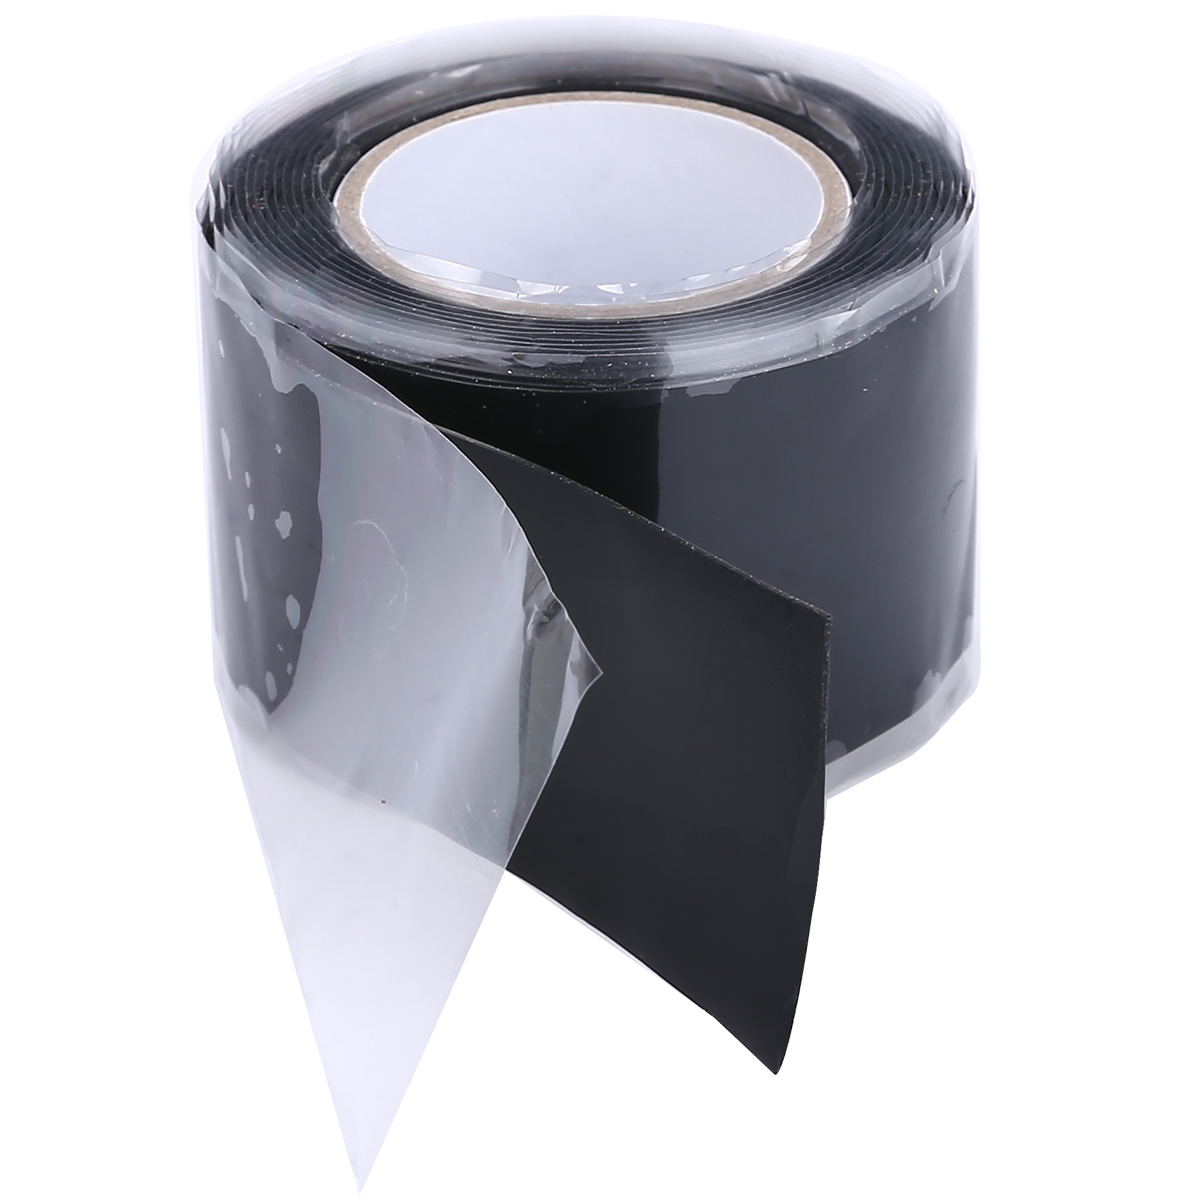 SOS Pipe Repair Tape Stop Water Leak burst plumbers waterproof Self amalgamating